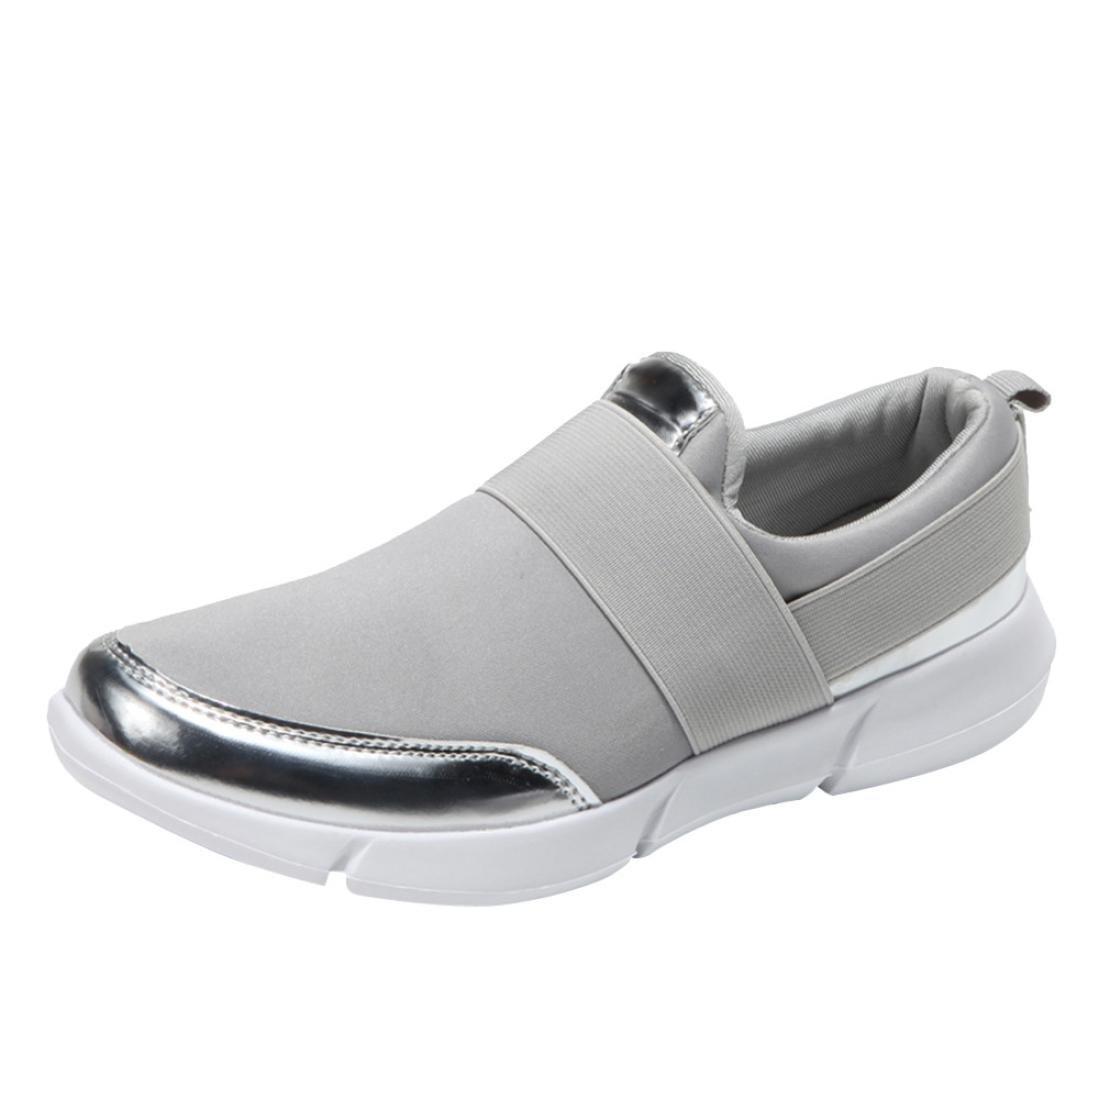 Lazzboy Damen Mesh Casual Faulenzer Atmungsaktive Flache Schuhe Weiche Laufschuhe Turnschuhe  38 EU|Grau